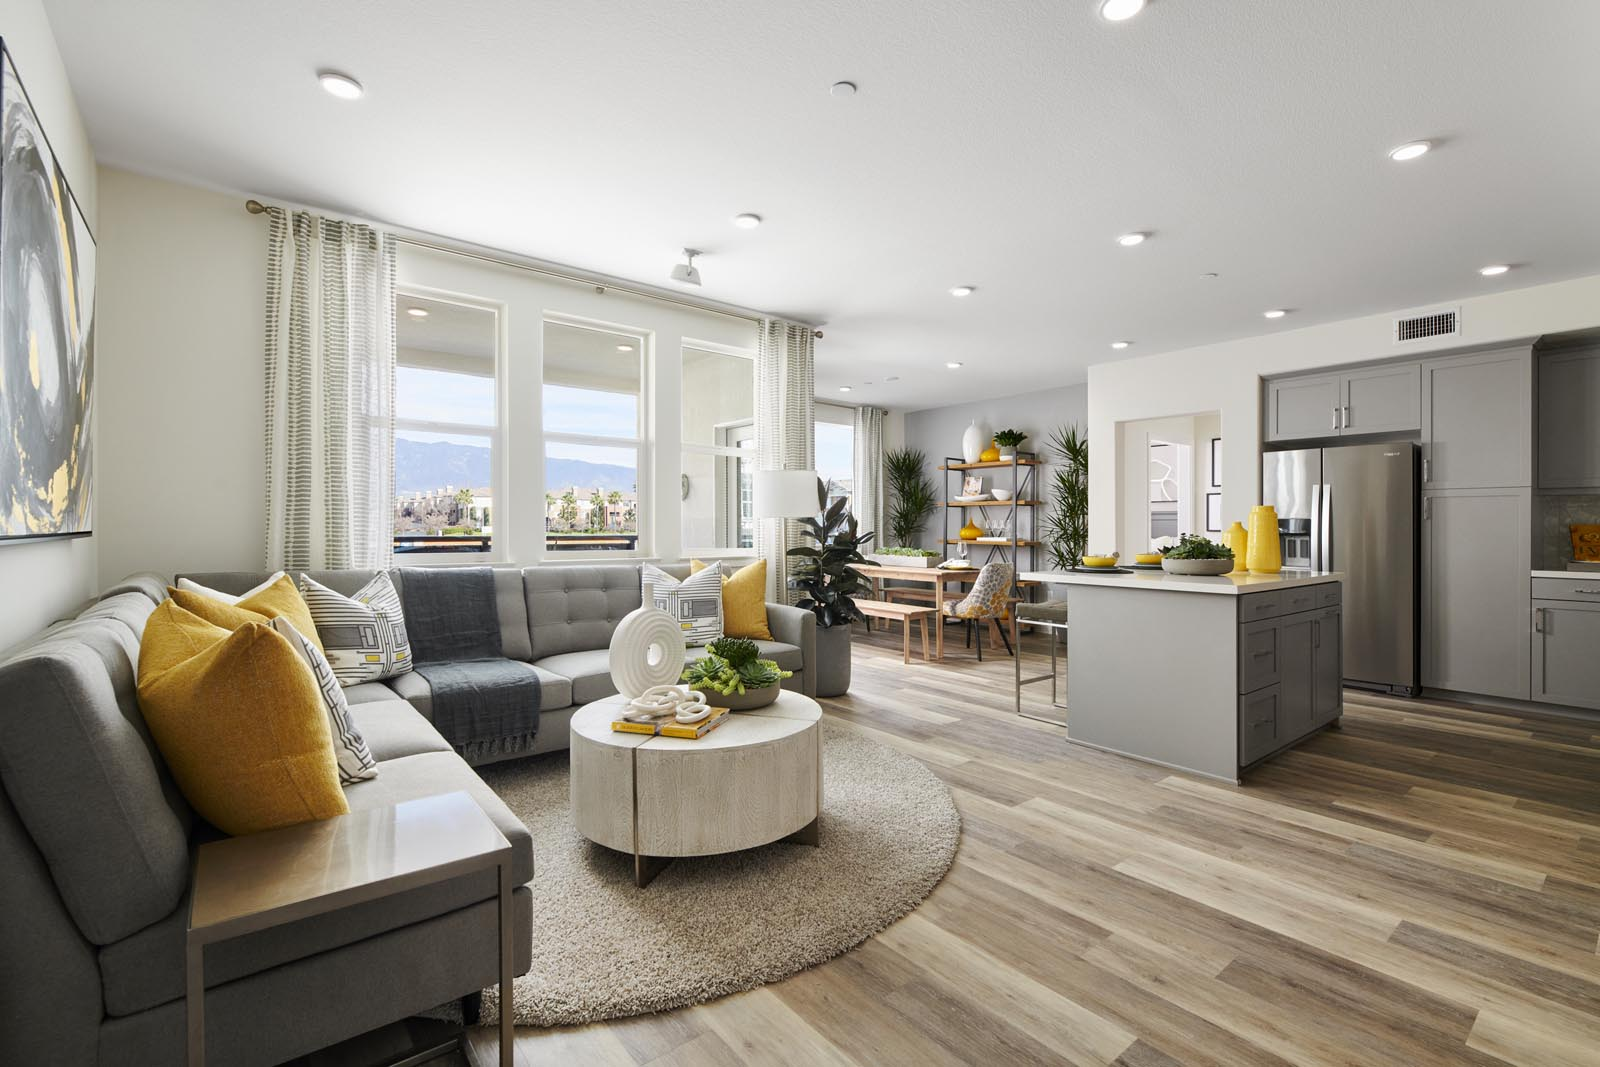 Great Room | Residence 1 | Aspire | New Homes in Rancho Cucamonga, CA | Van Daele Homes